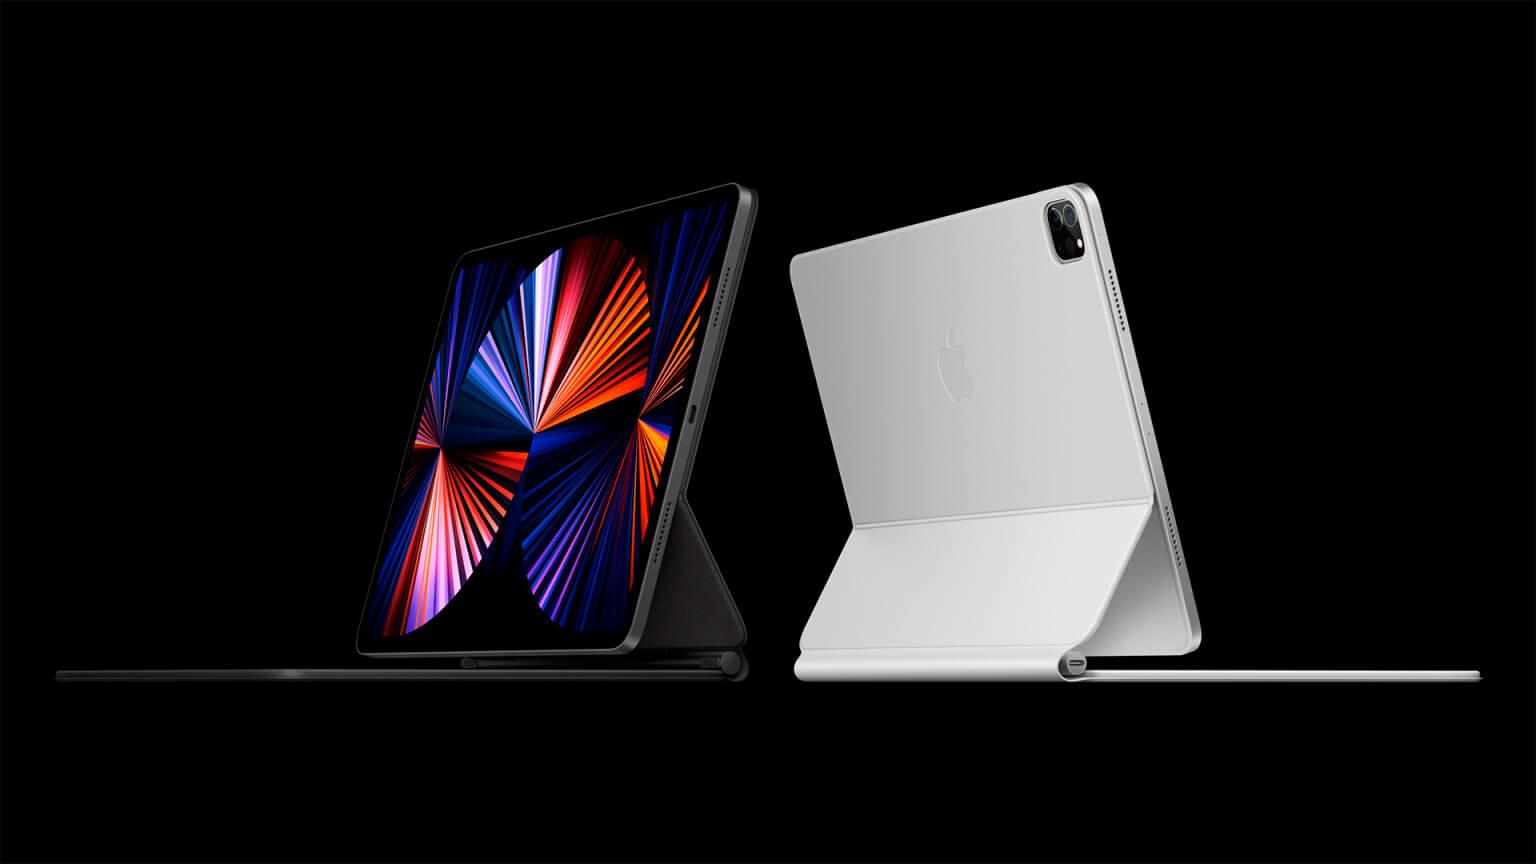 Is iPad Pro 2020 worth upgrading?